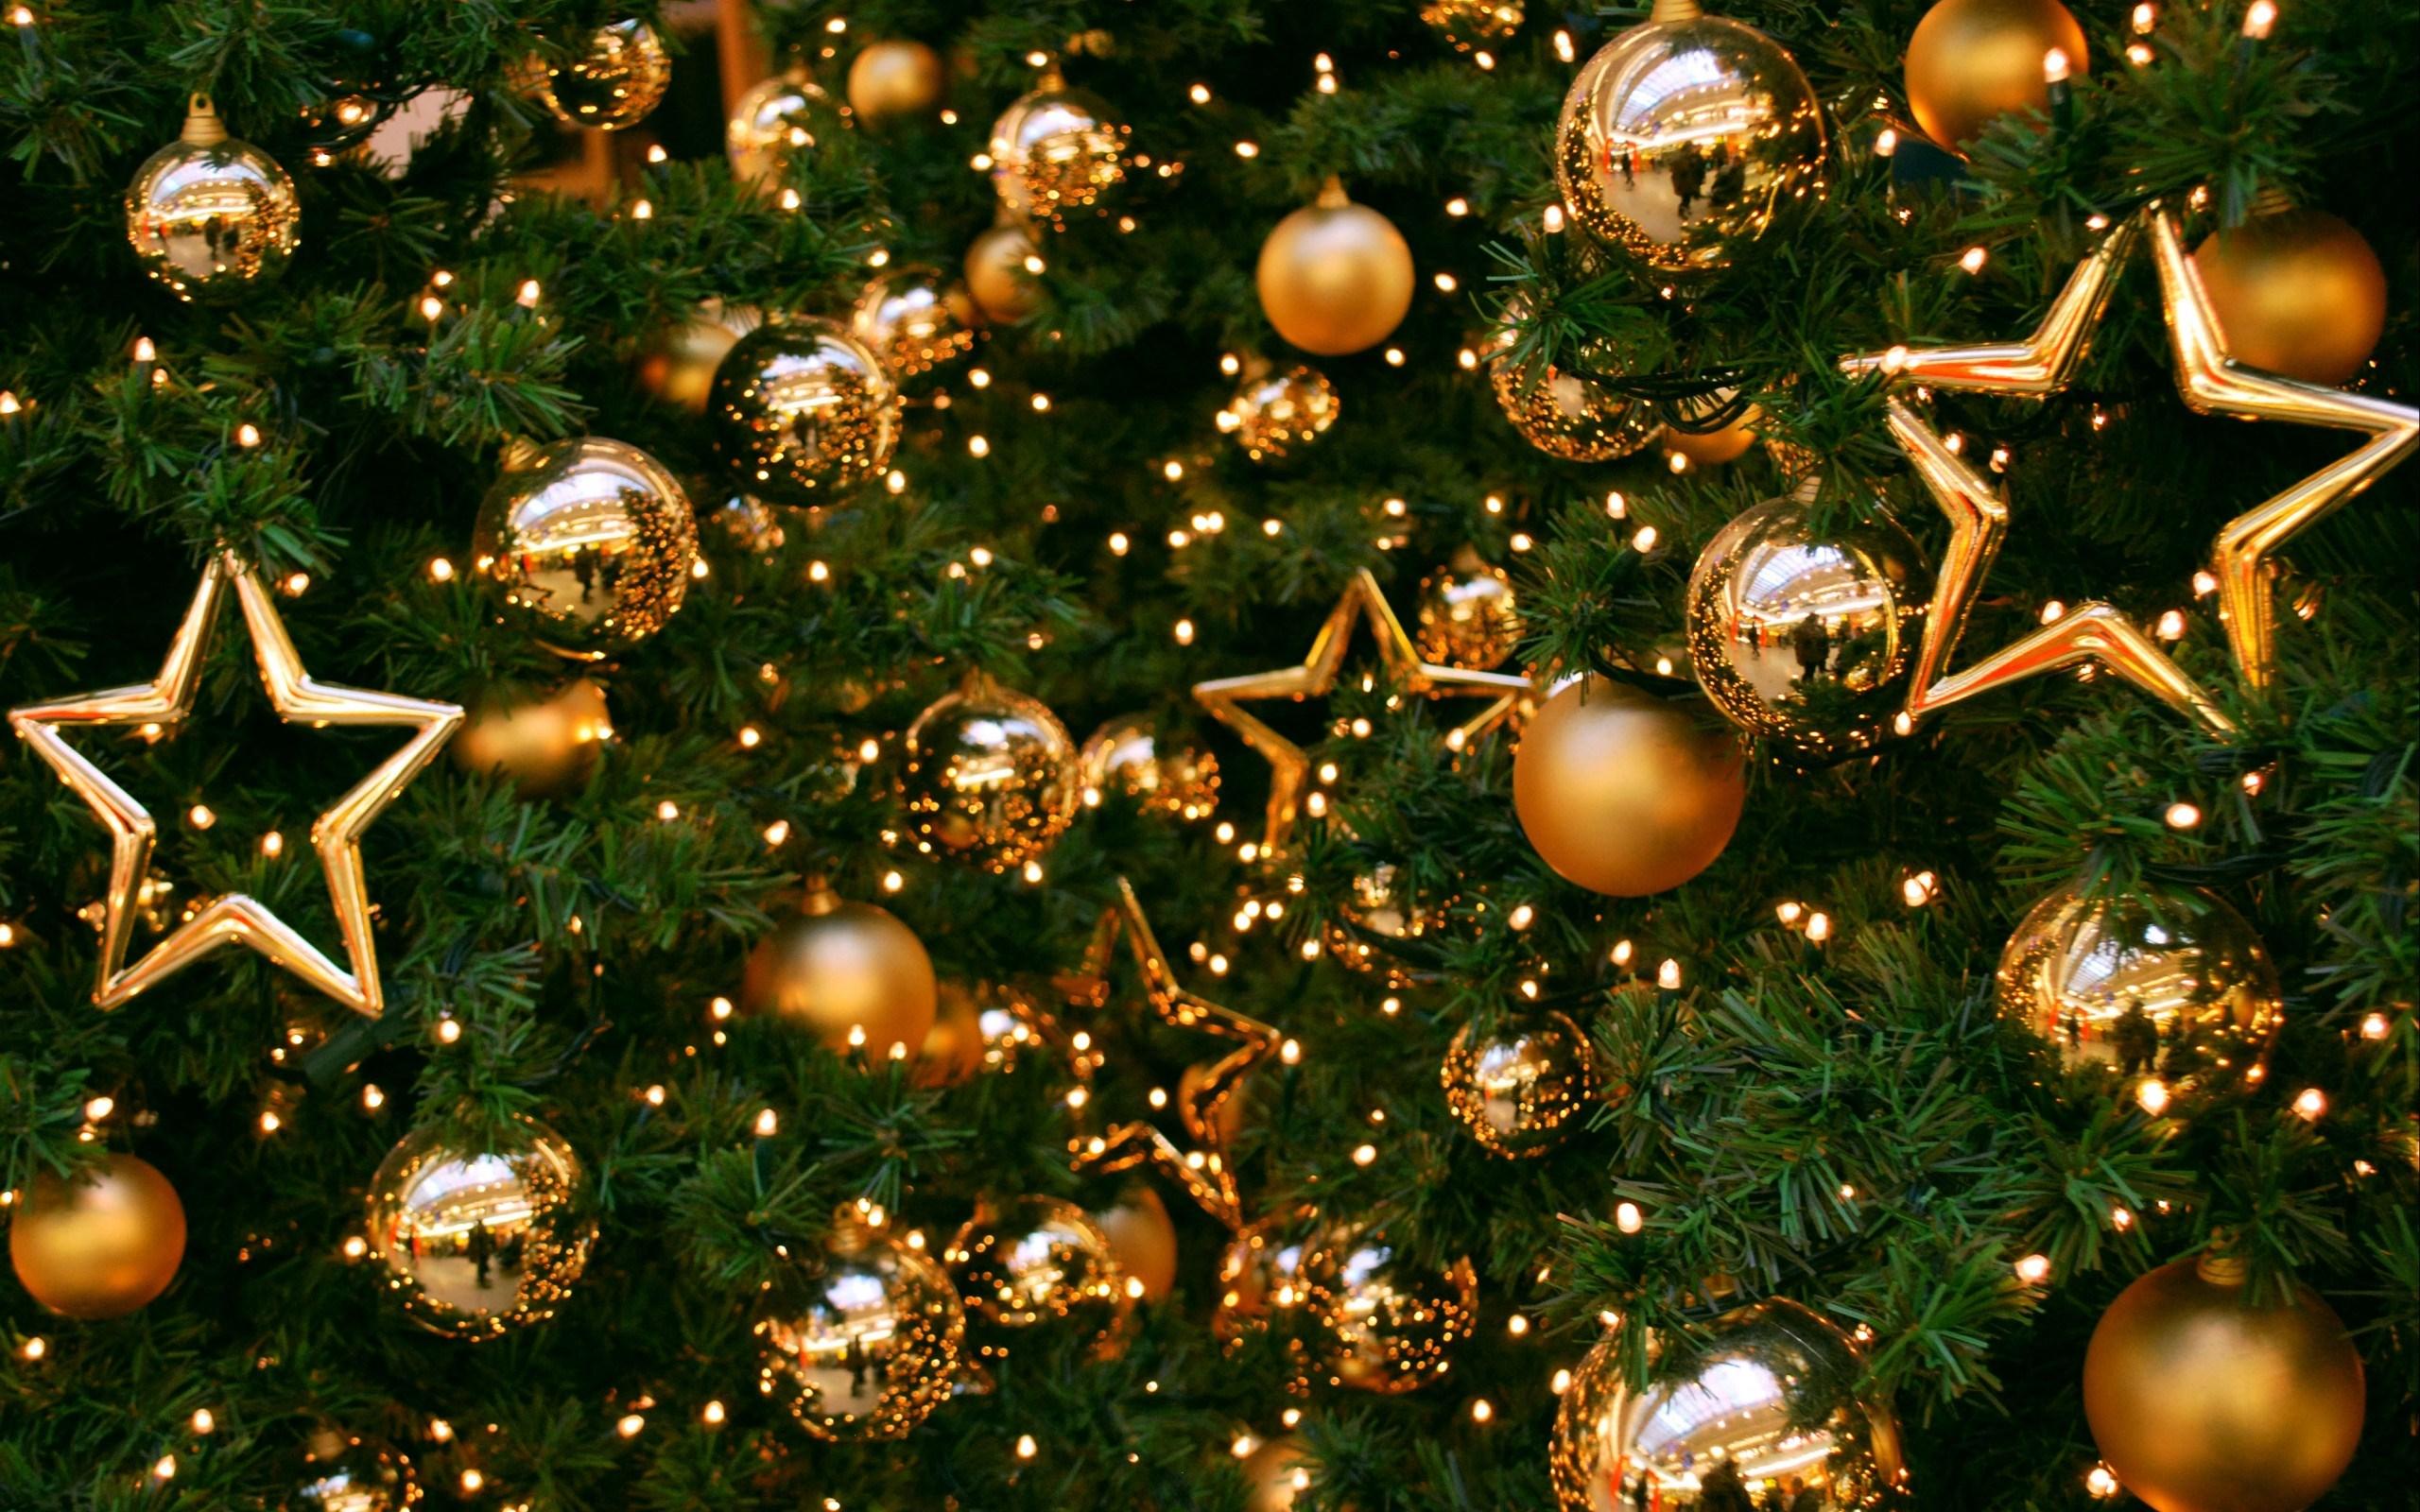 Wonderful Holiday Decorations Wallpaper